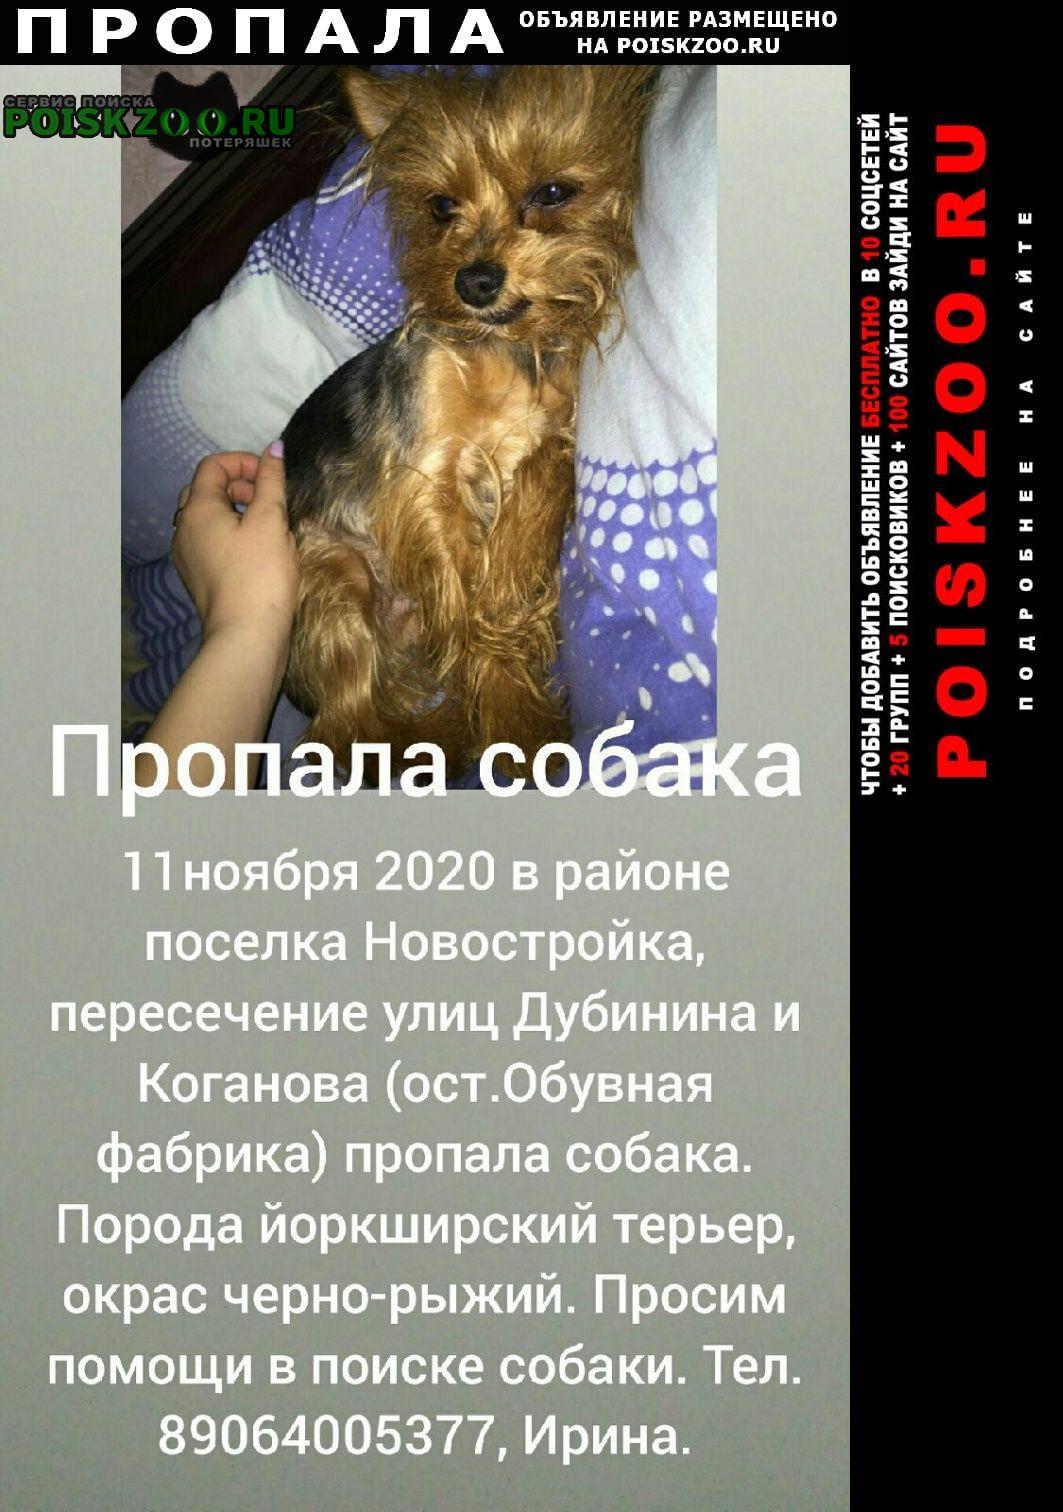 Пропала собака йоркширский терьер Волгоград